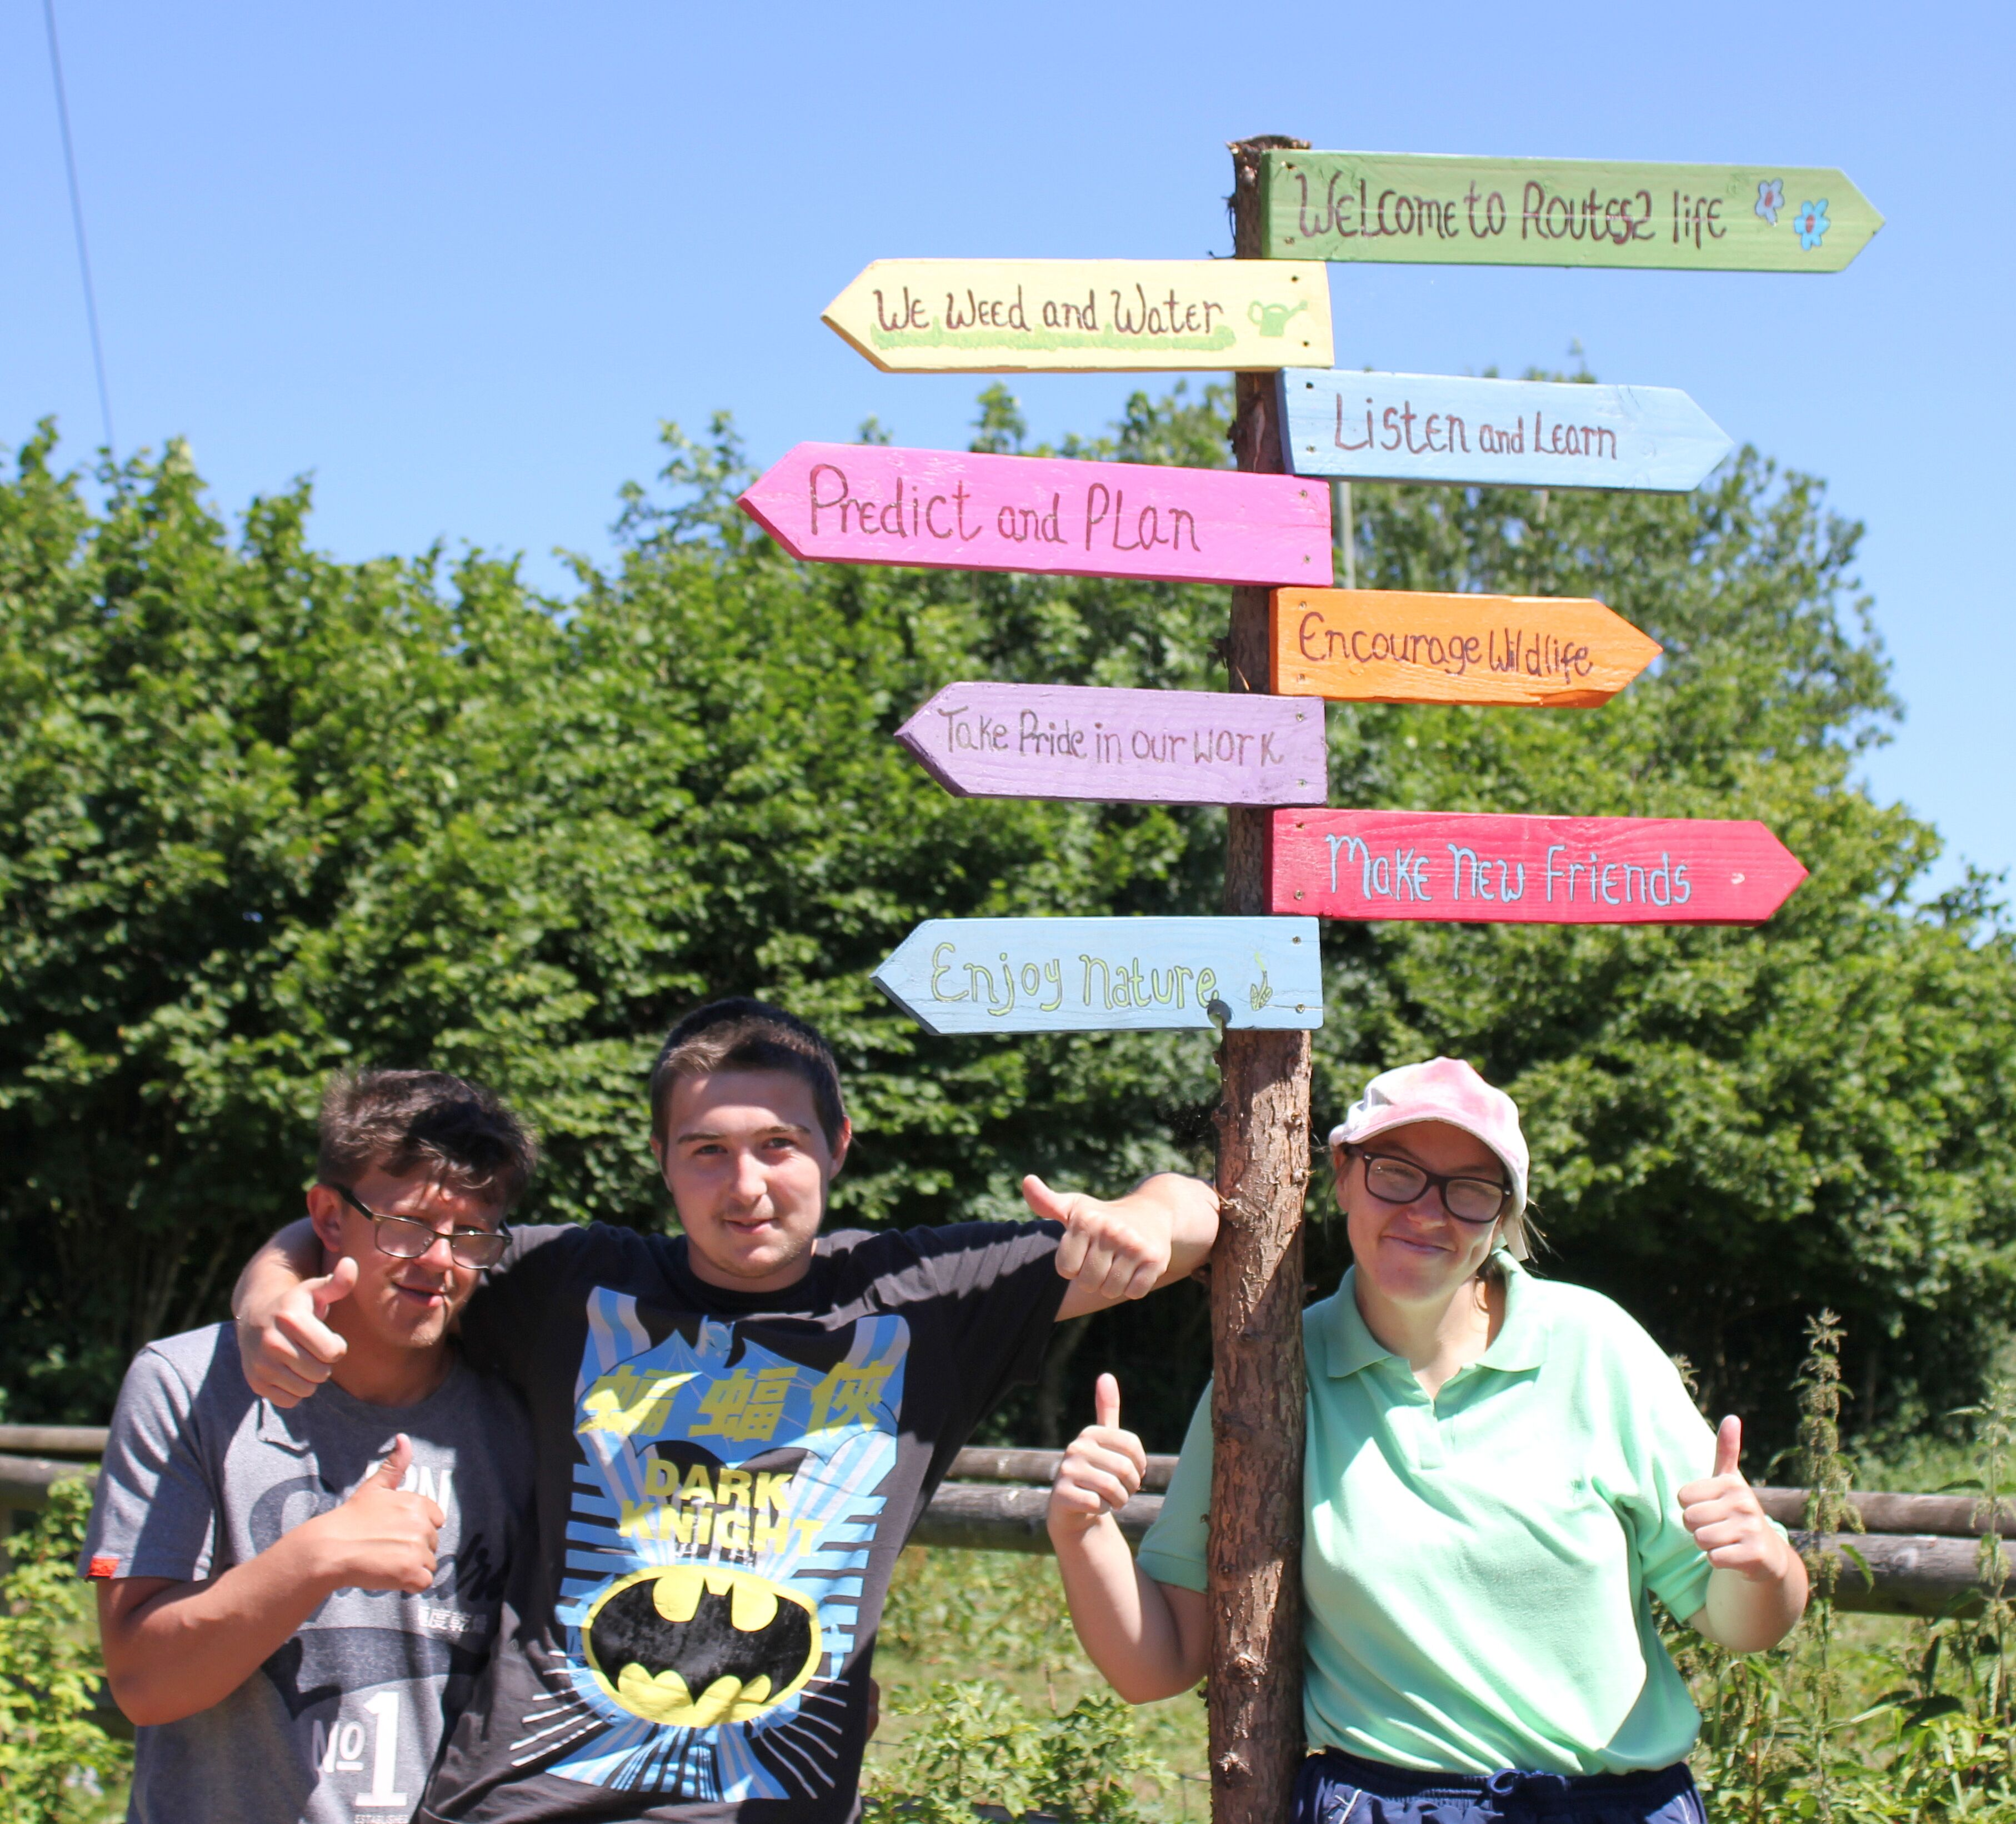 Routes 2 Life